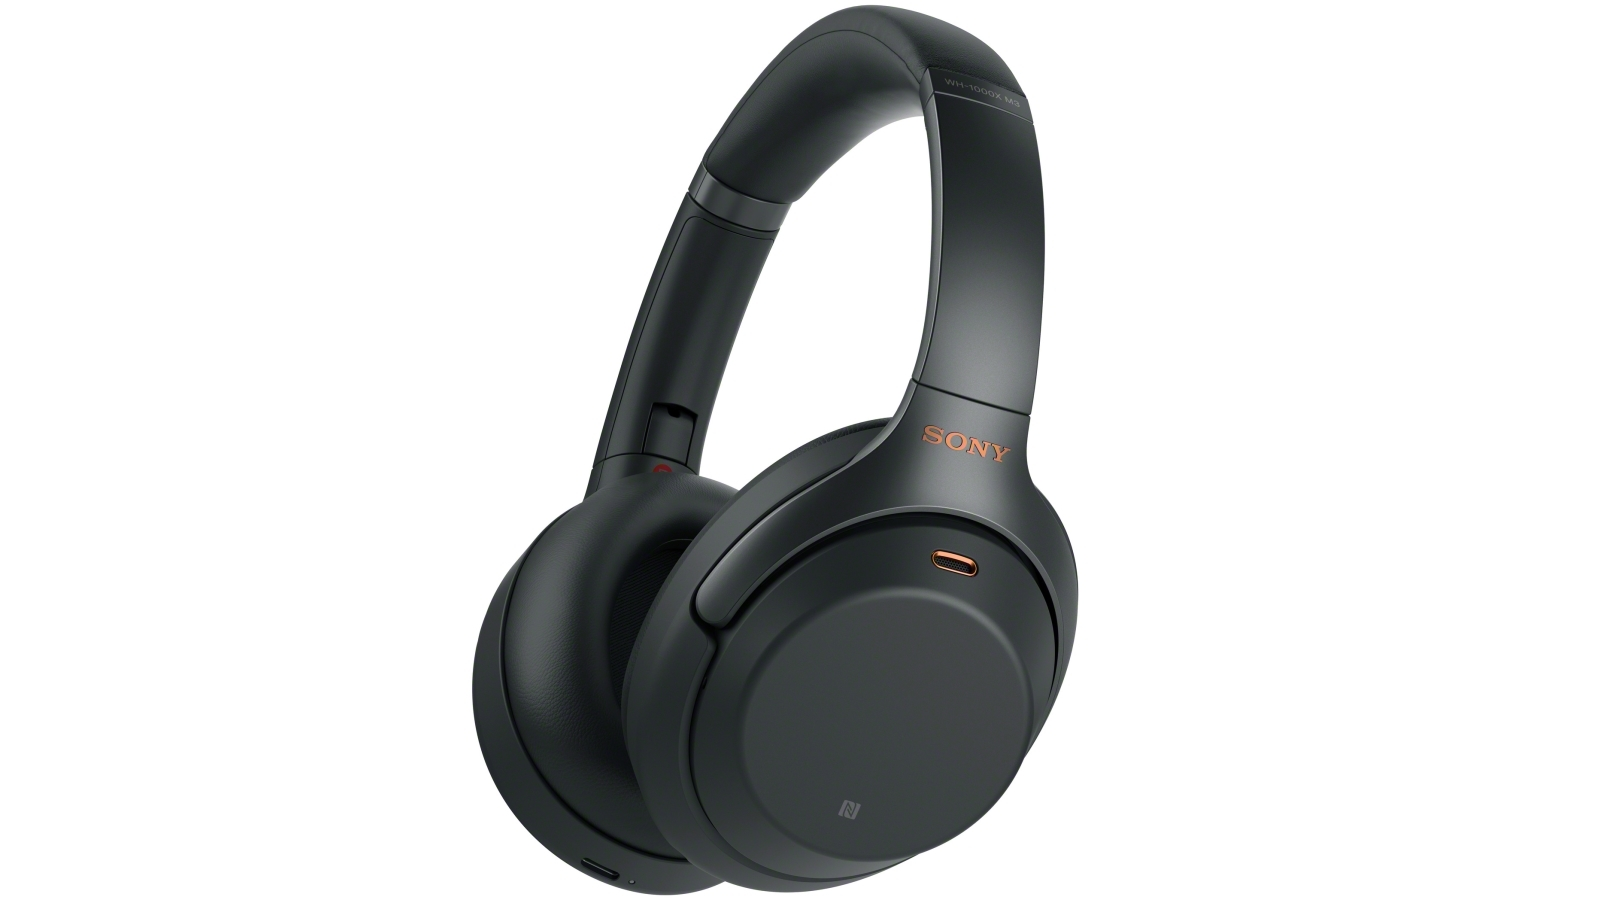 e82587e2ead Buy Sony WH-1000XM3 Wireless Noise Cancelling Headphones - Black | Harvey  Norman AU